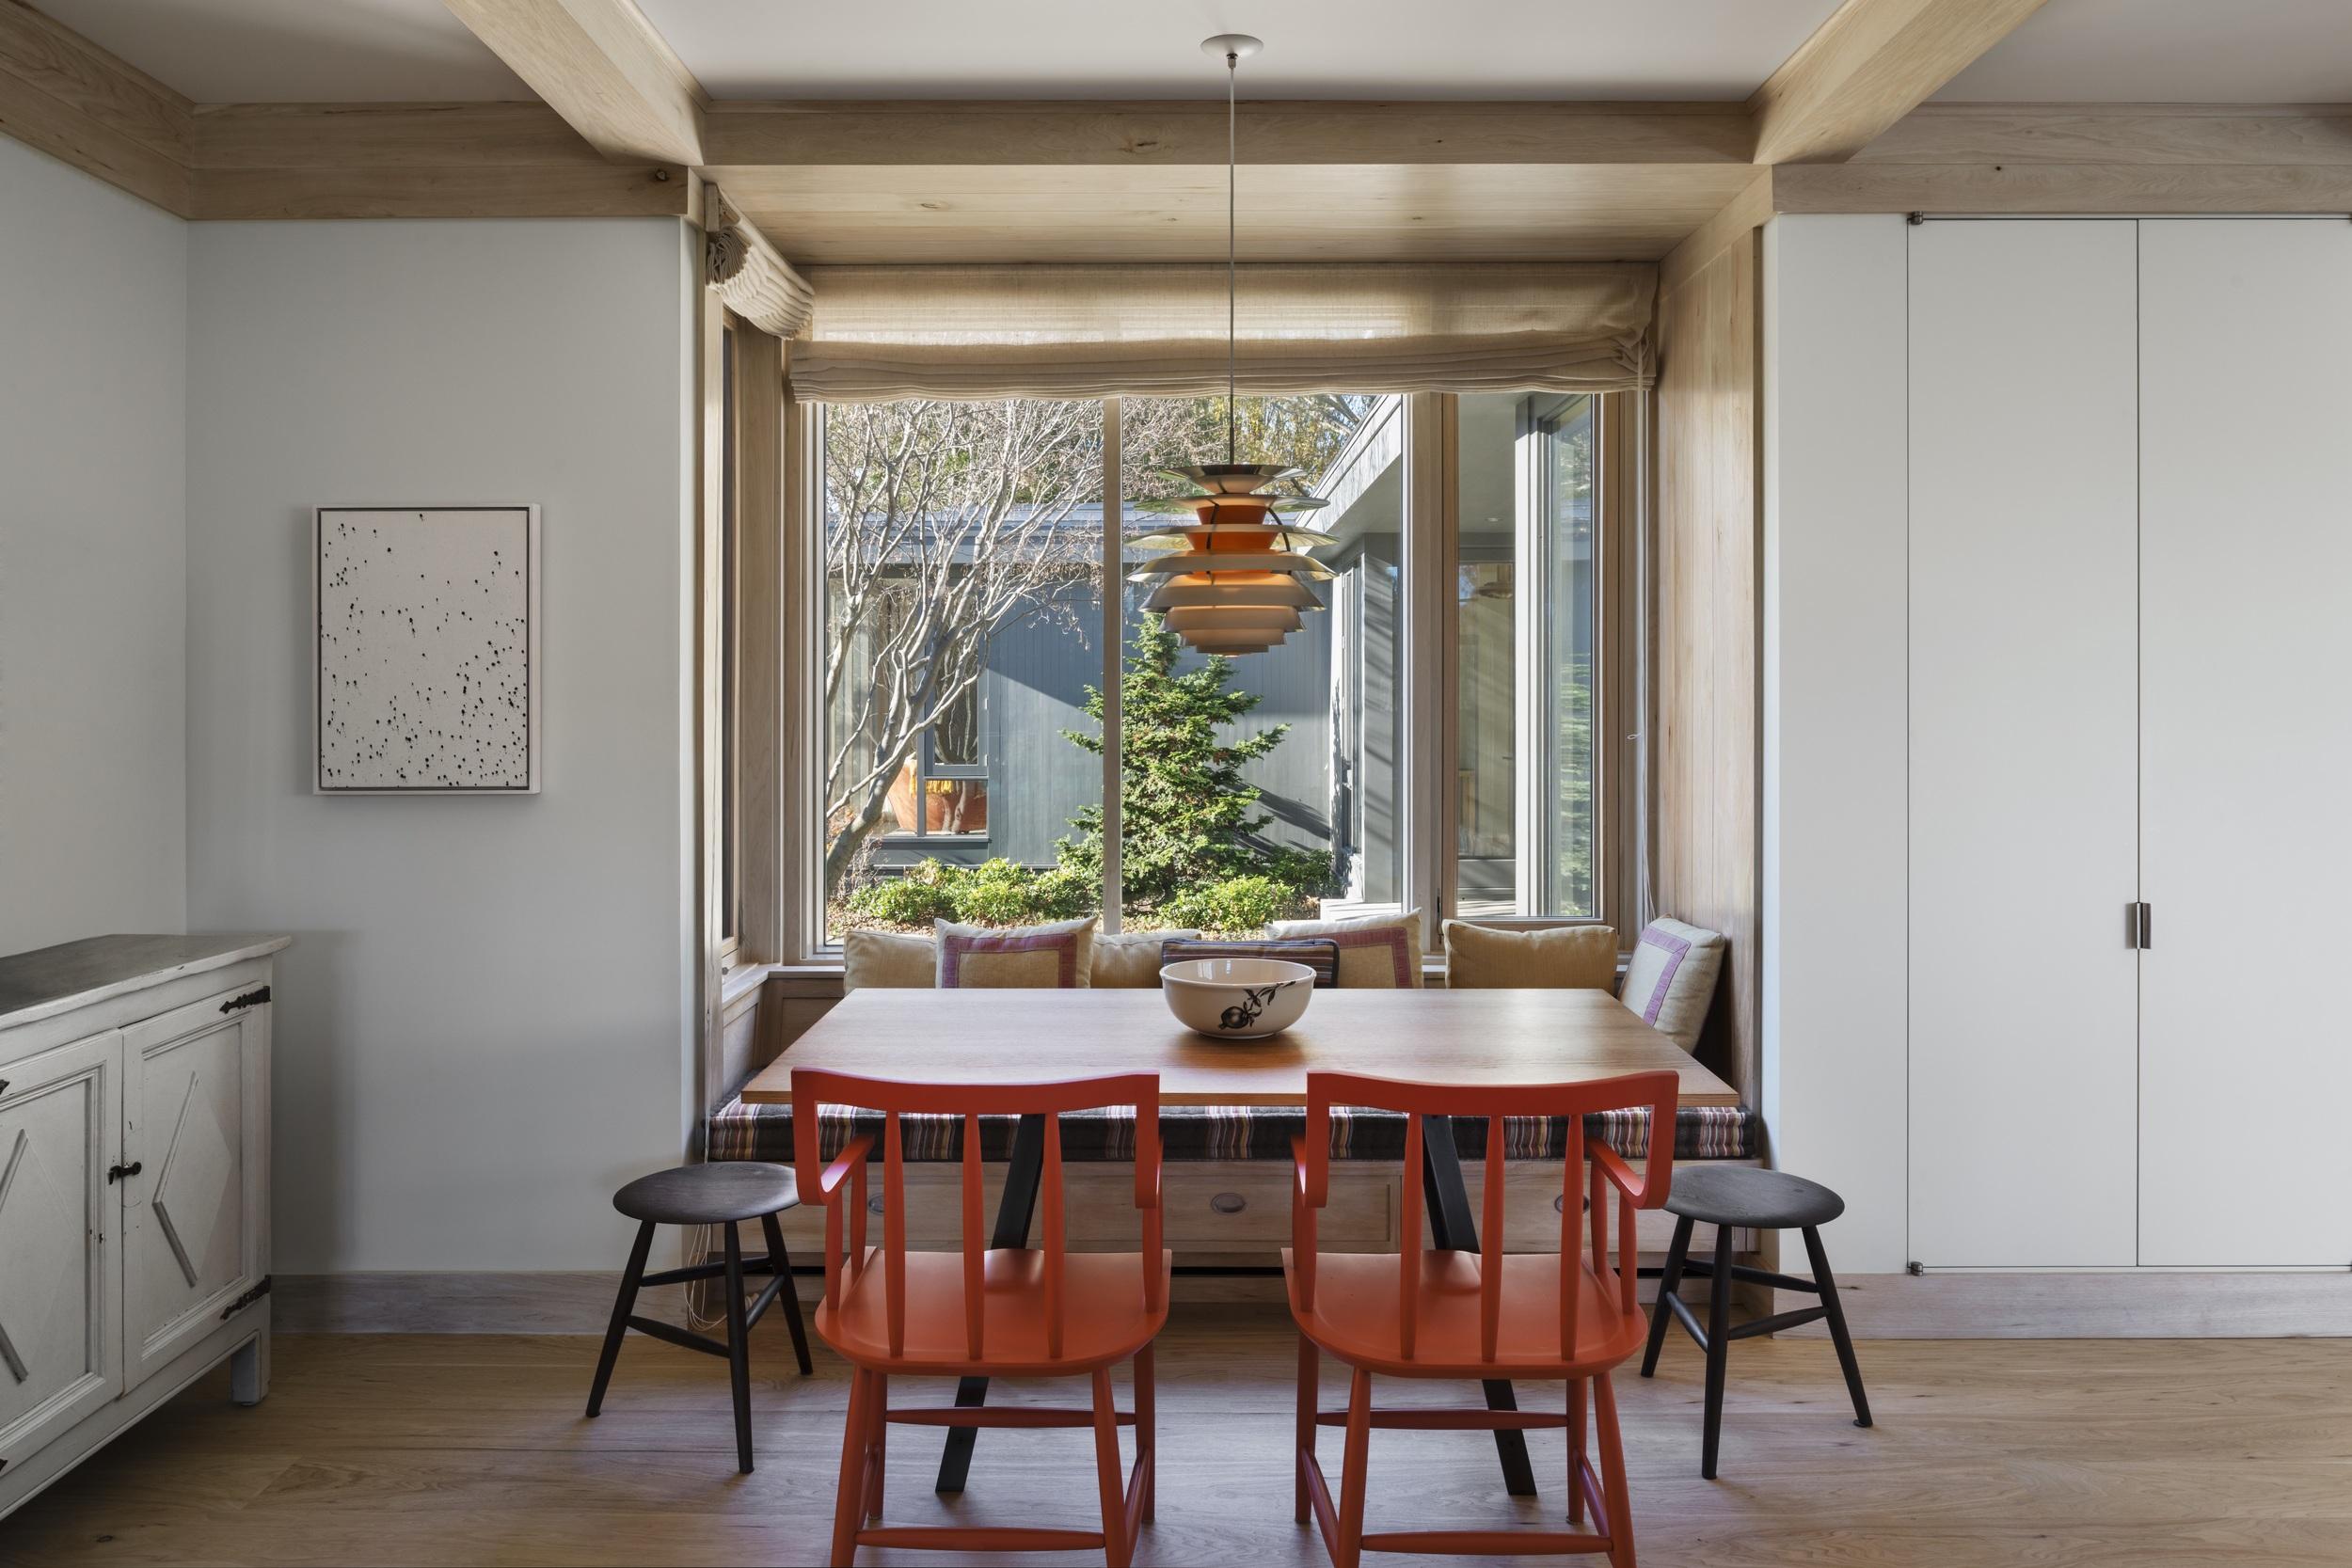 Interiors by Ellen Hanson Designs, photography by Raimund Koch, 2015